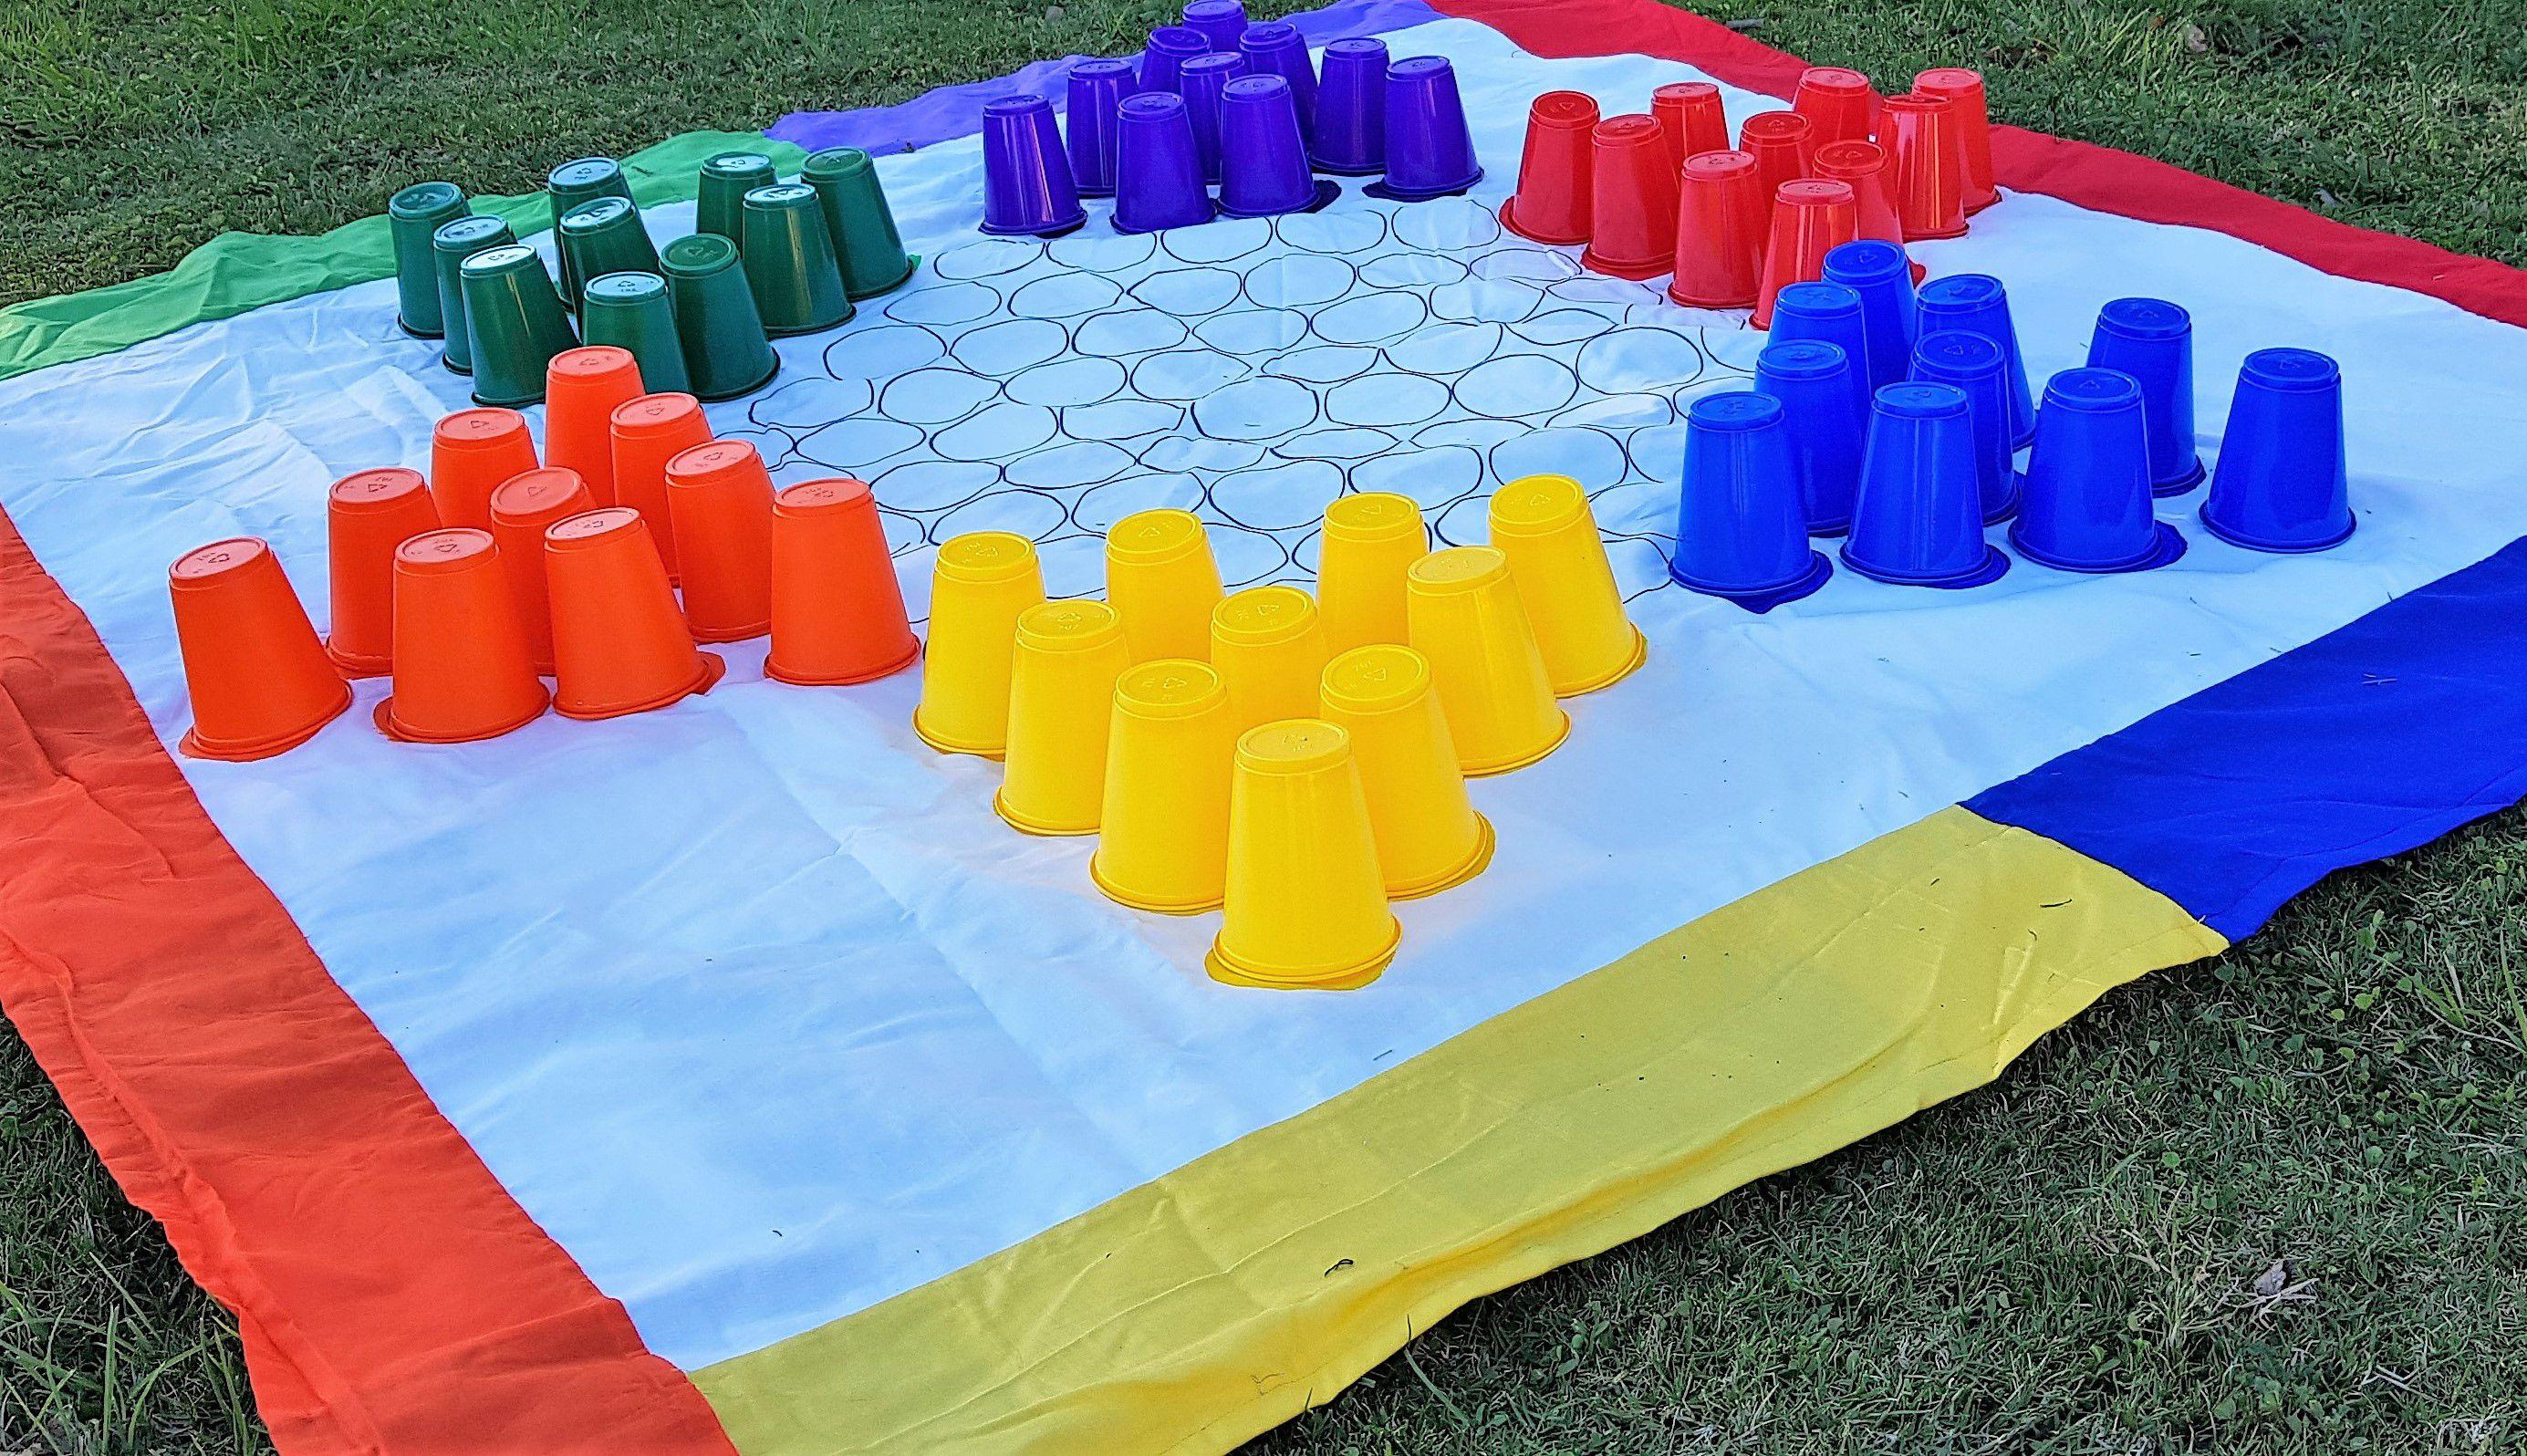 outdoorgames lawngames yardgames campinggames eventgames beachgames weddinggames giantgames